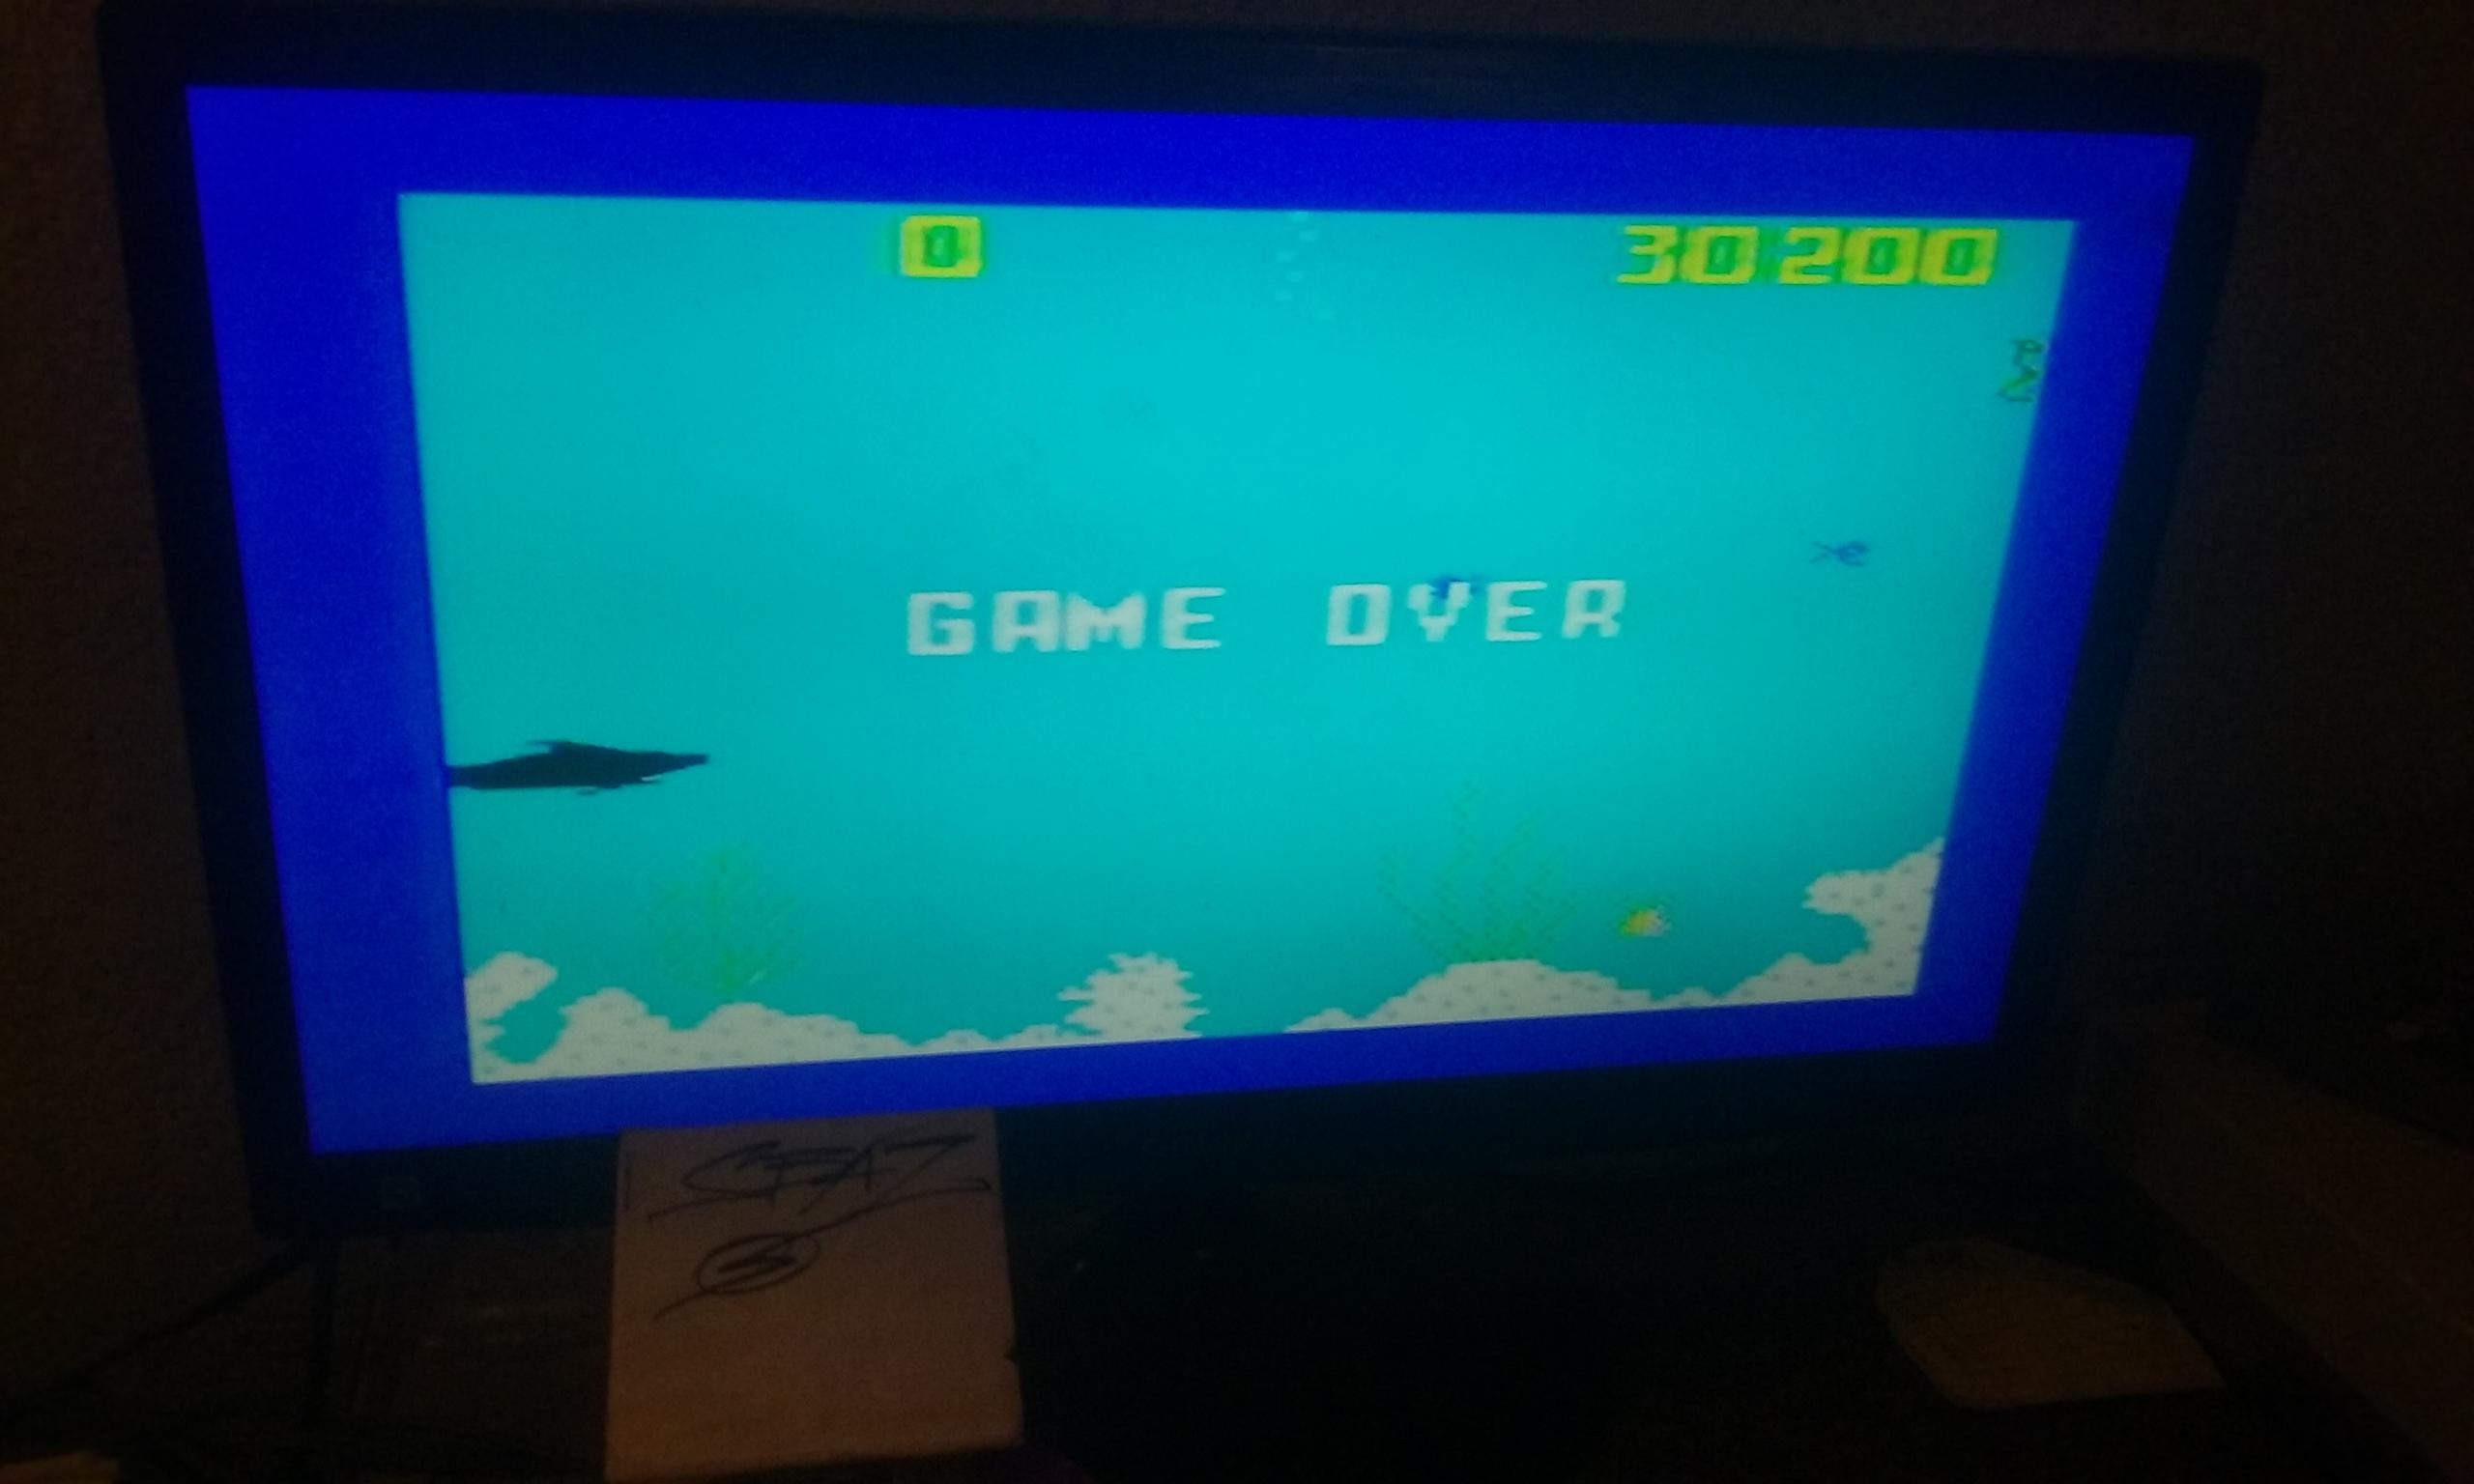 S.BAZ: Shark! Shark!: Normal Mode (Intellivision) 30,200 points on 2017-12-04 23:22:04